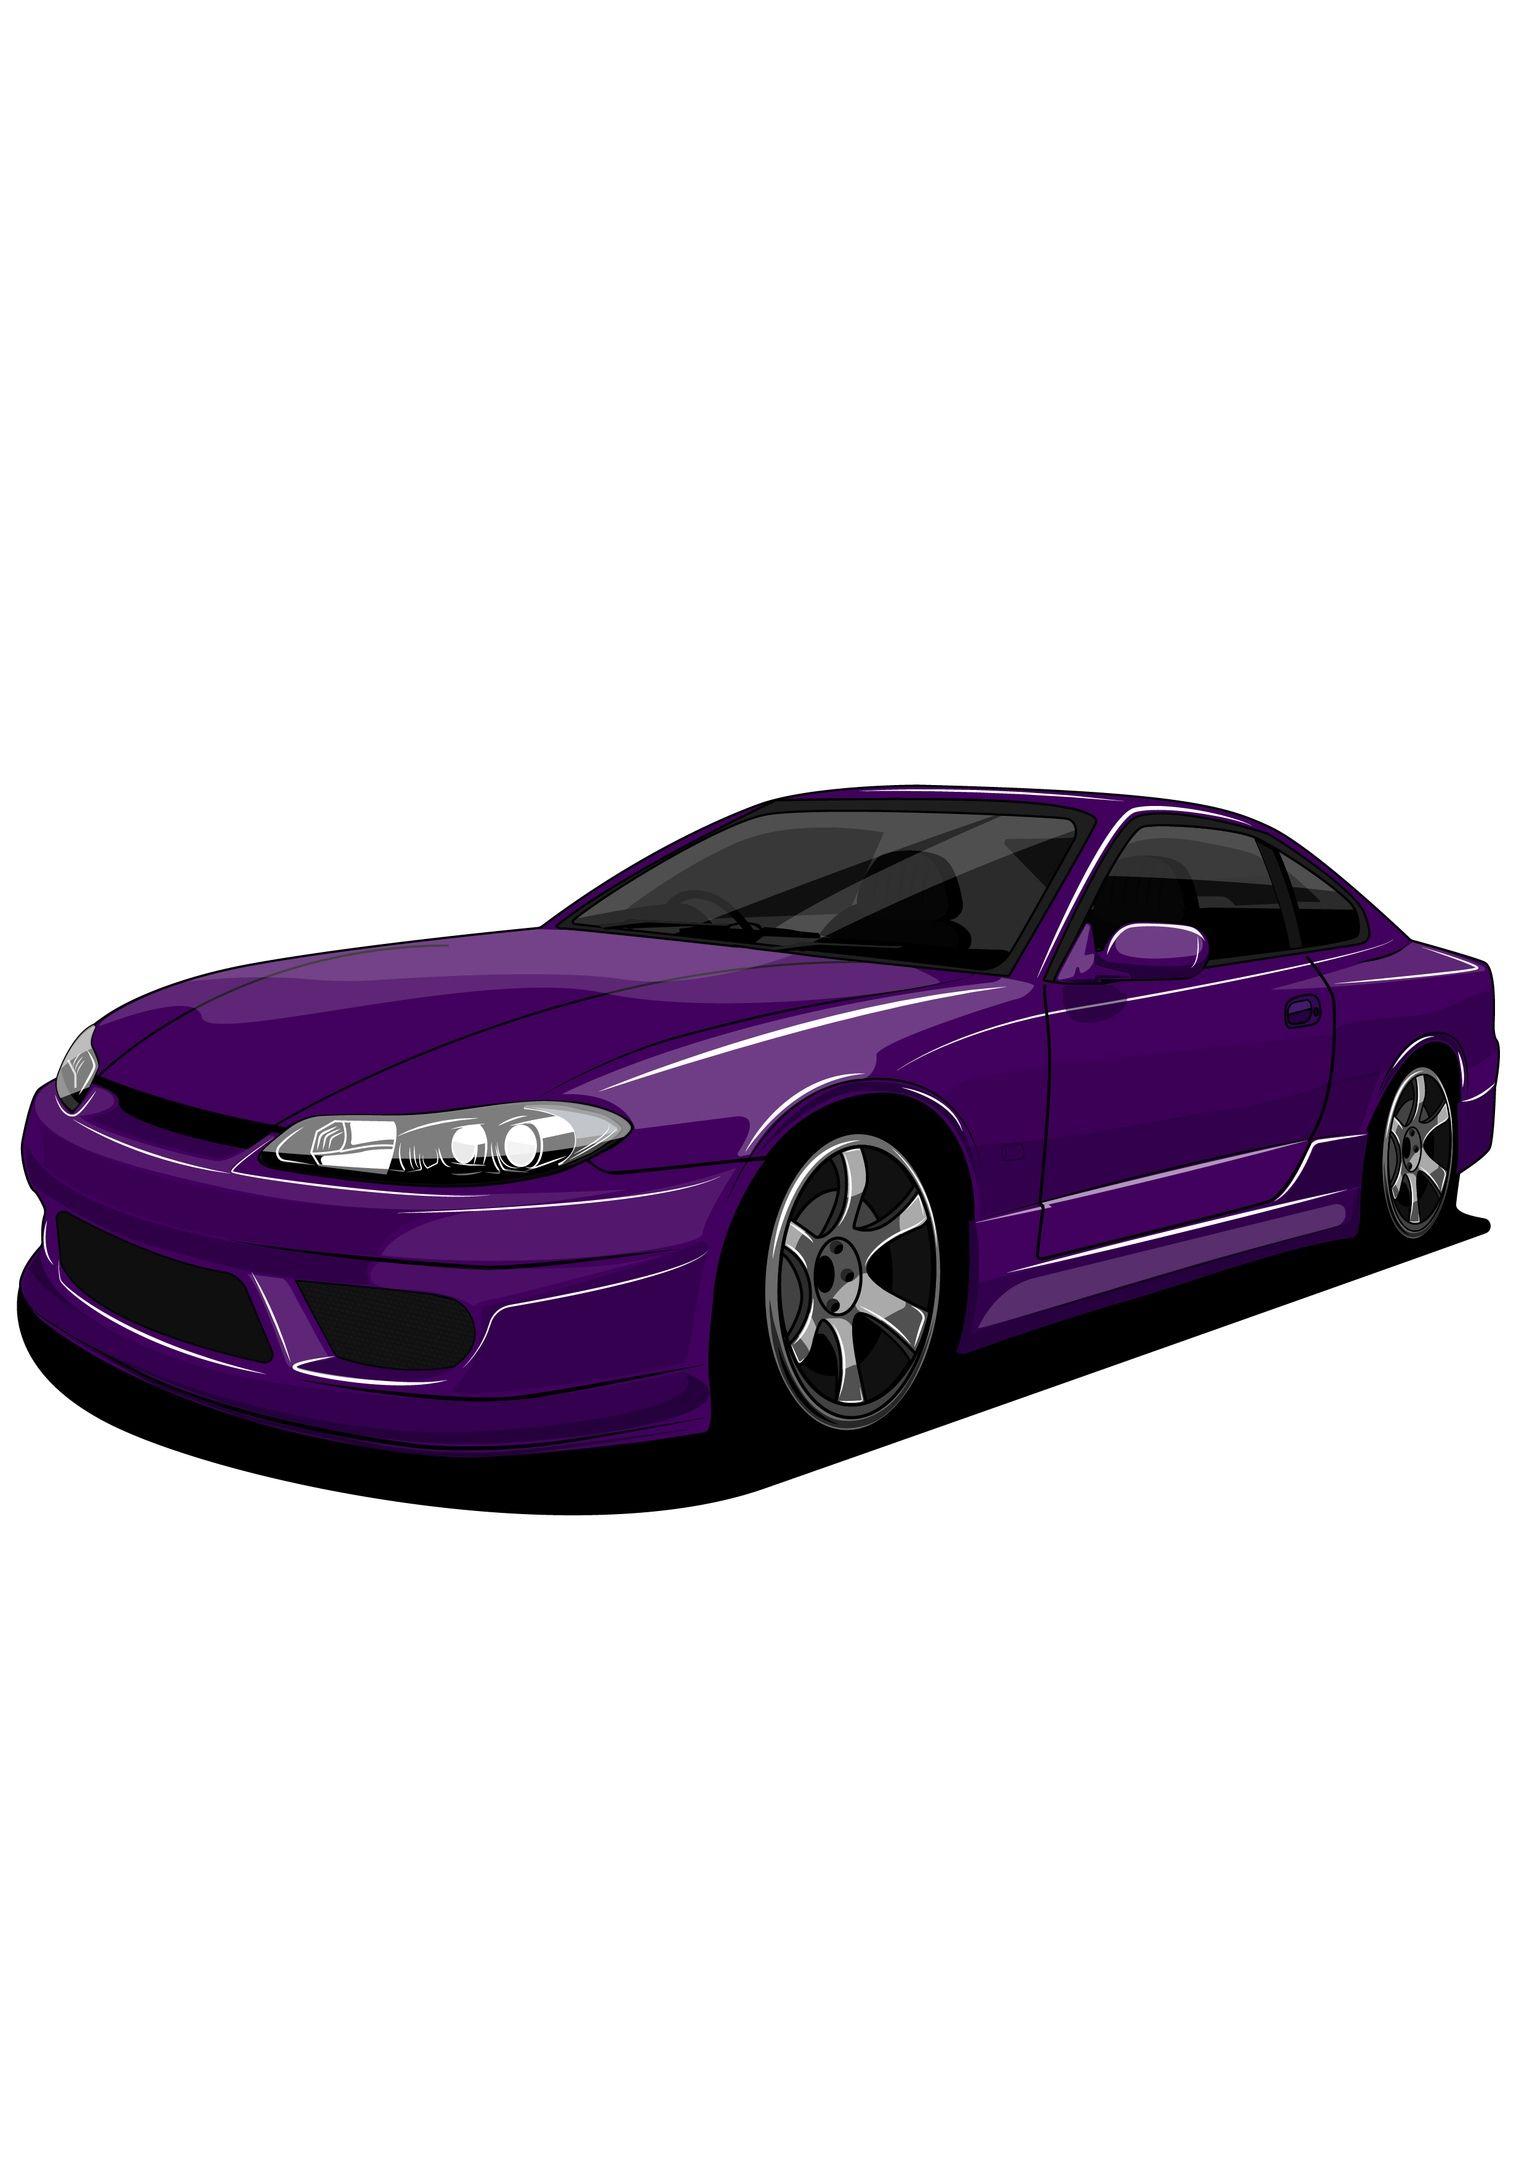 nissan silvia s15 #vector #art #draw #nissan #jdm #japan #silvia  #illustrator #illustration #carvector #illustration   nissan silvia, car  vector, car illustration  pinterest